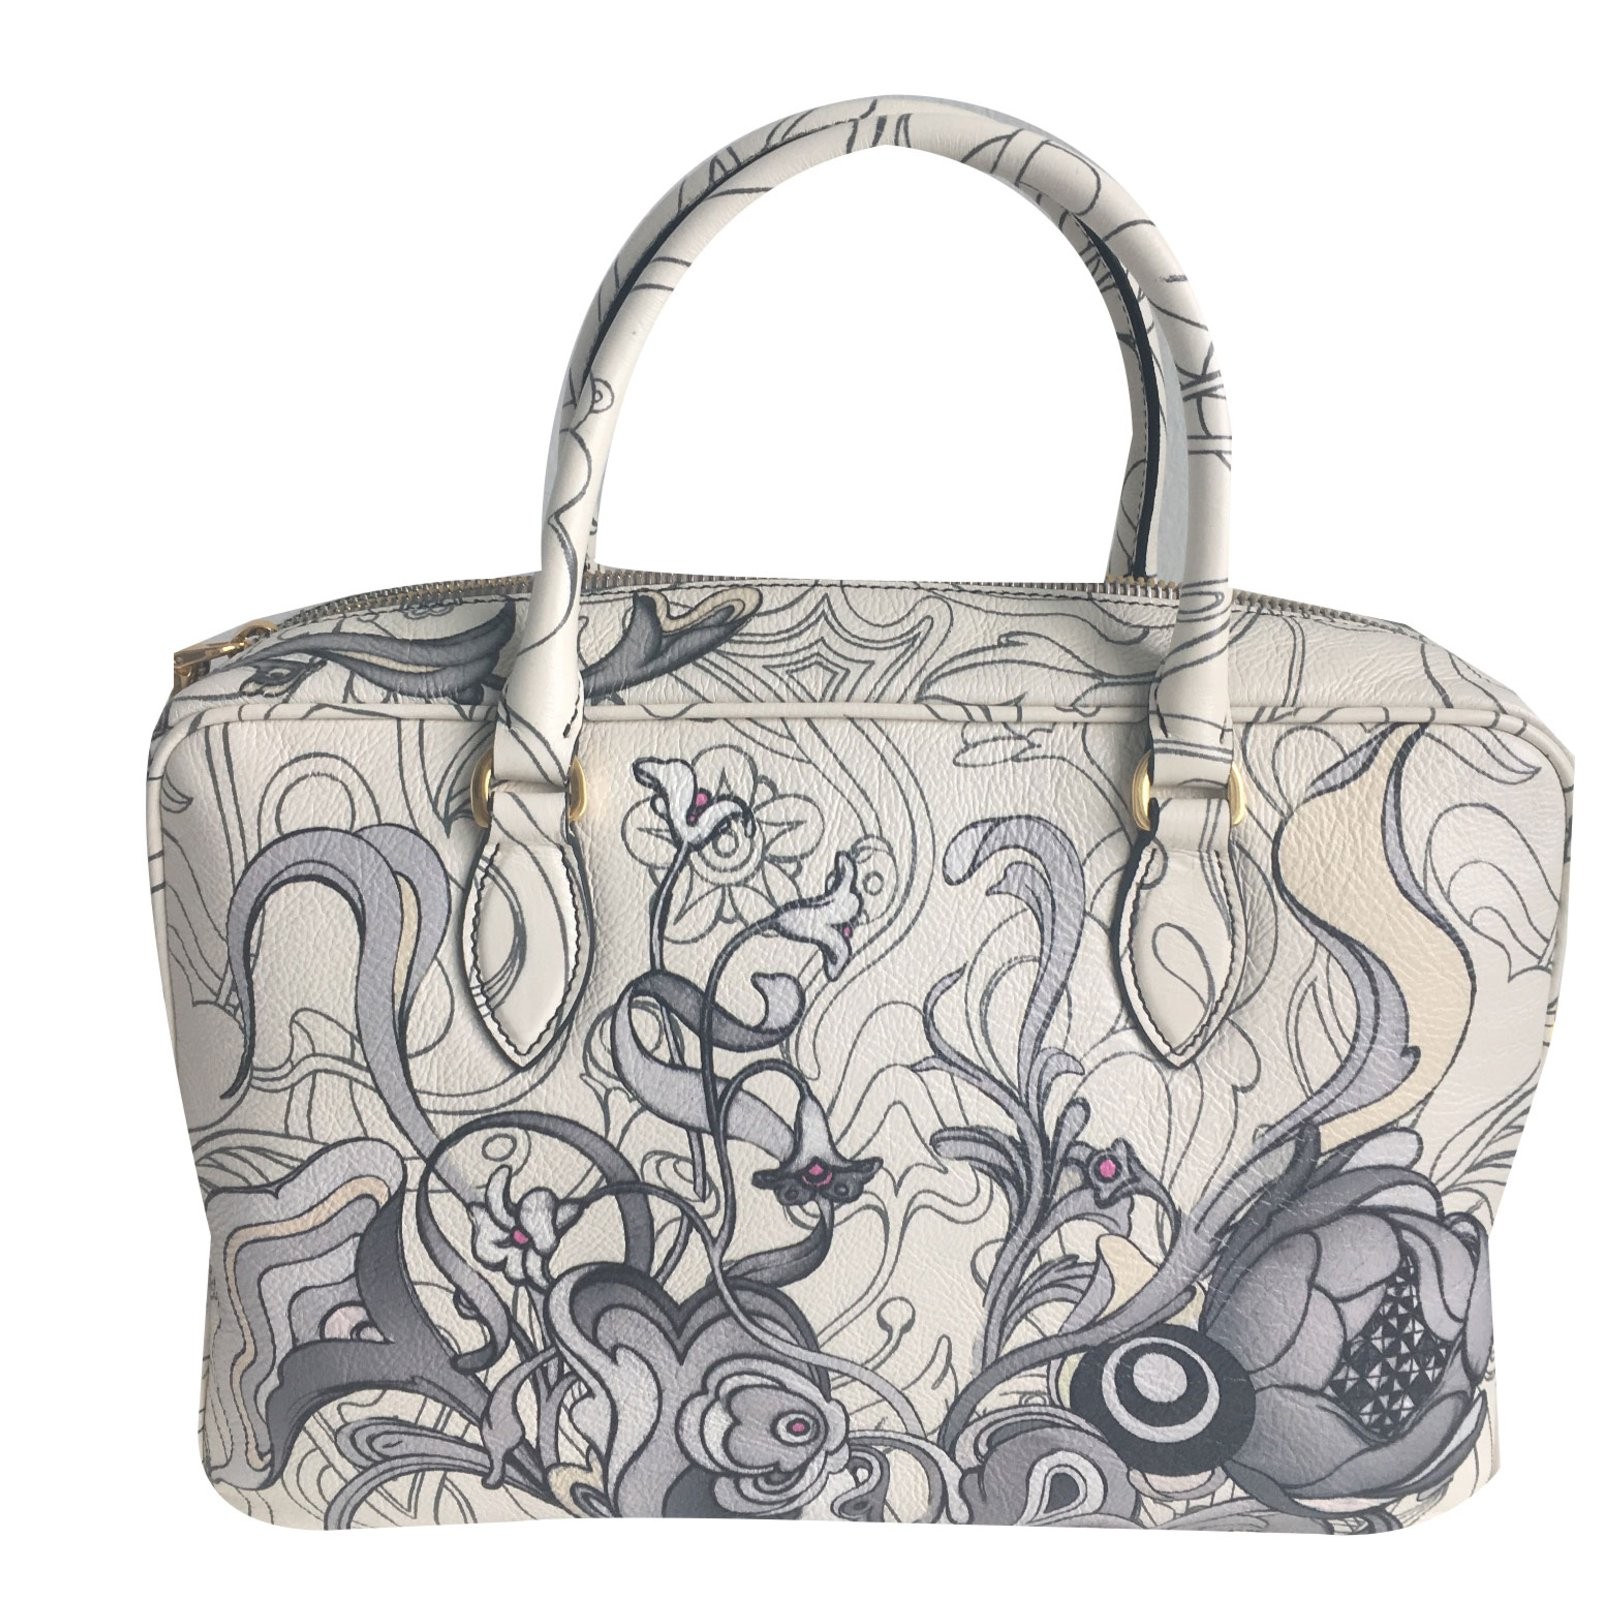 d70d53966da5 Prada Rabbit bag ressort 2018 Collection Handbags Leather Ebony ref.76187 -  Joli Closet